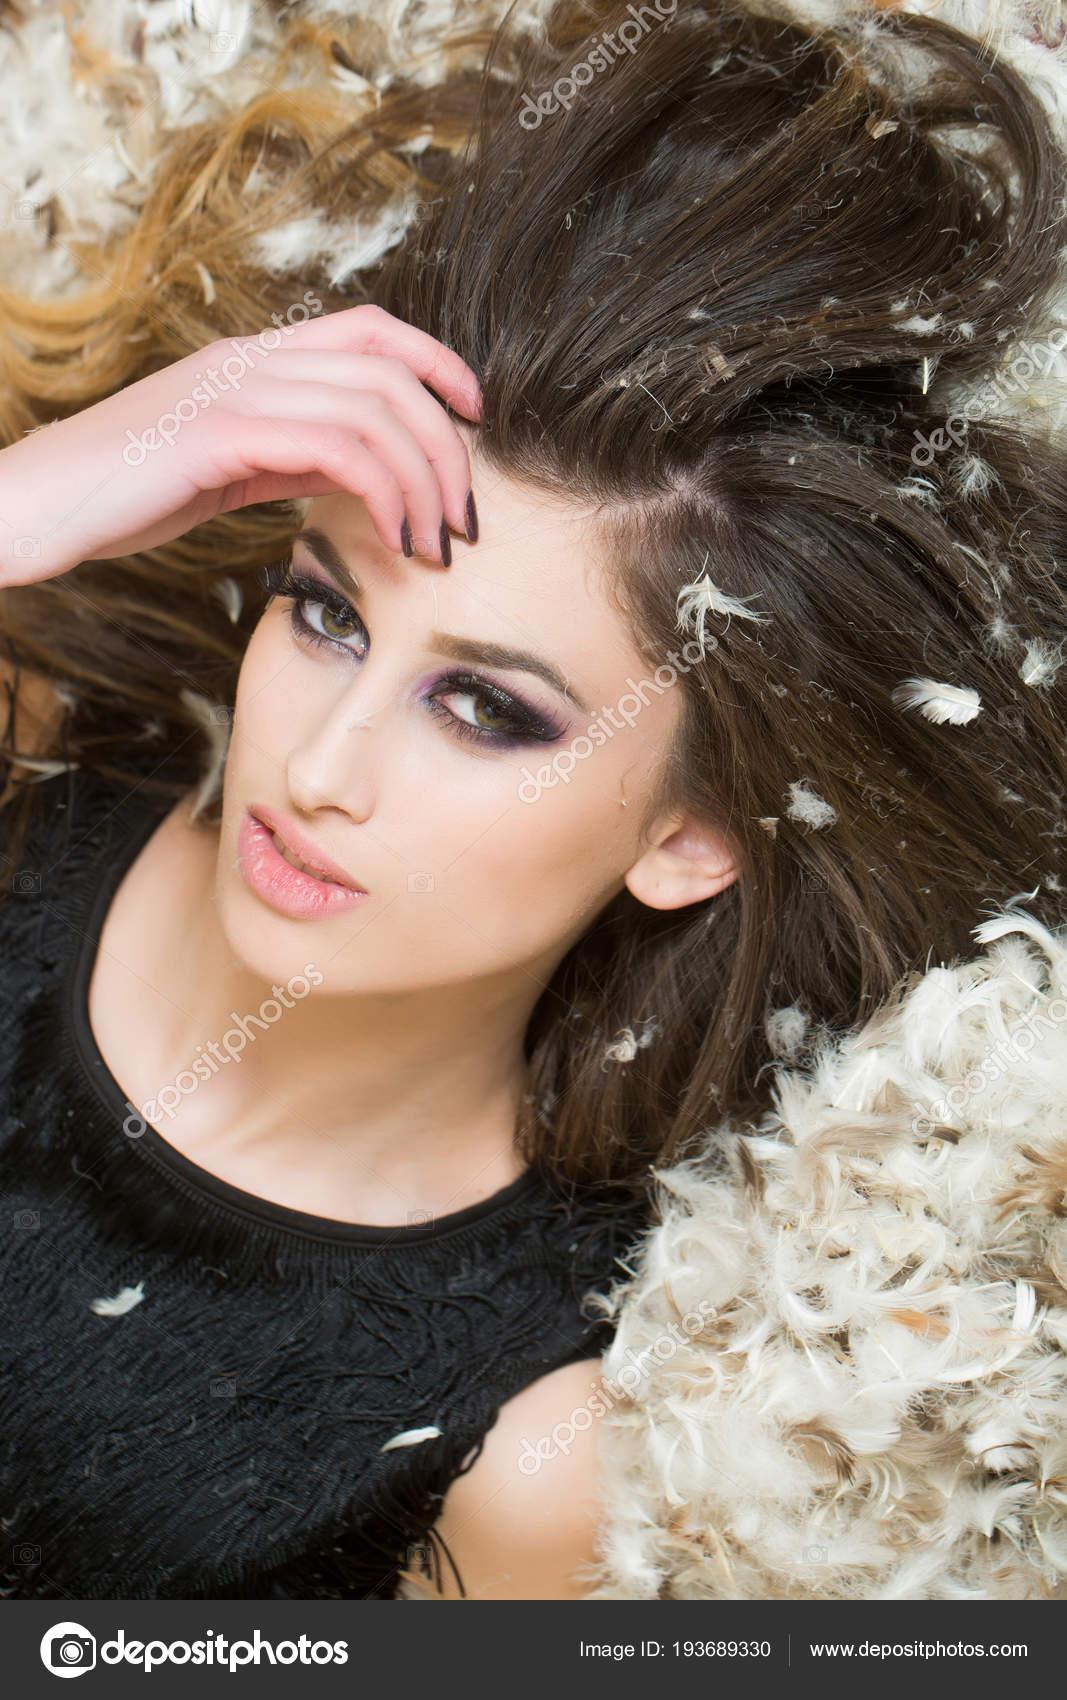 Woman Feathers Long Brunette Hair Sensual Woman Makeup Face